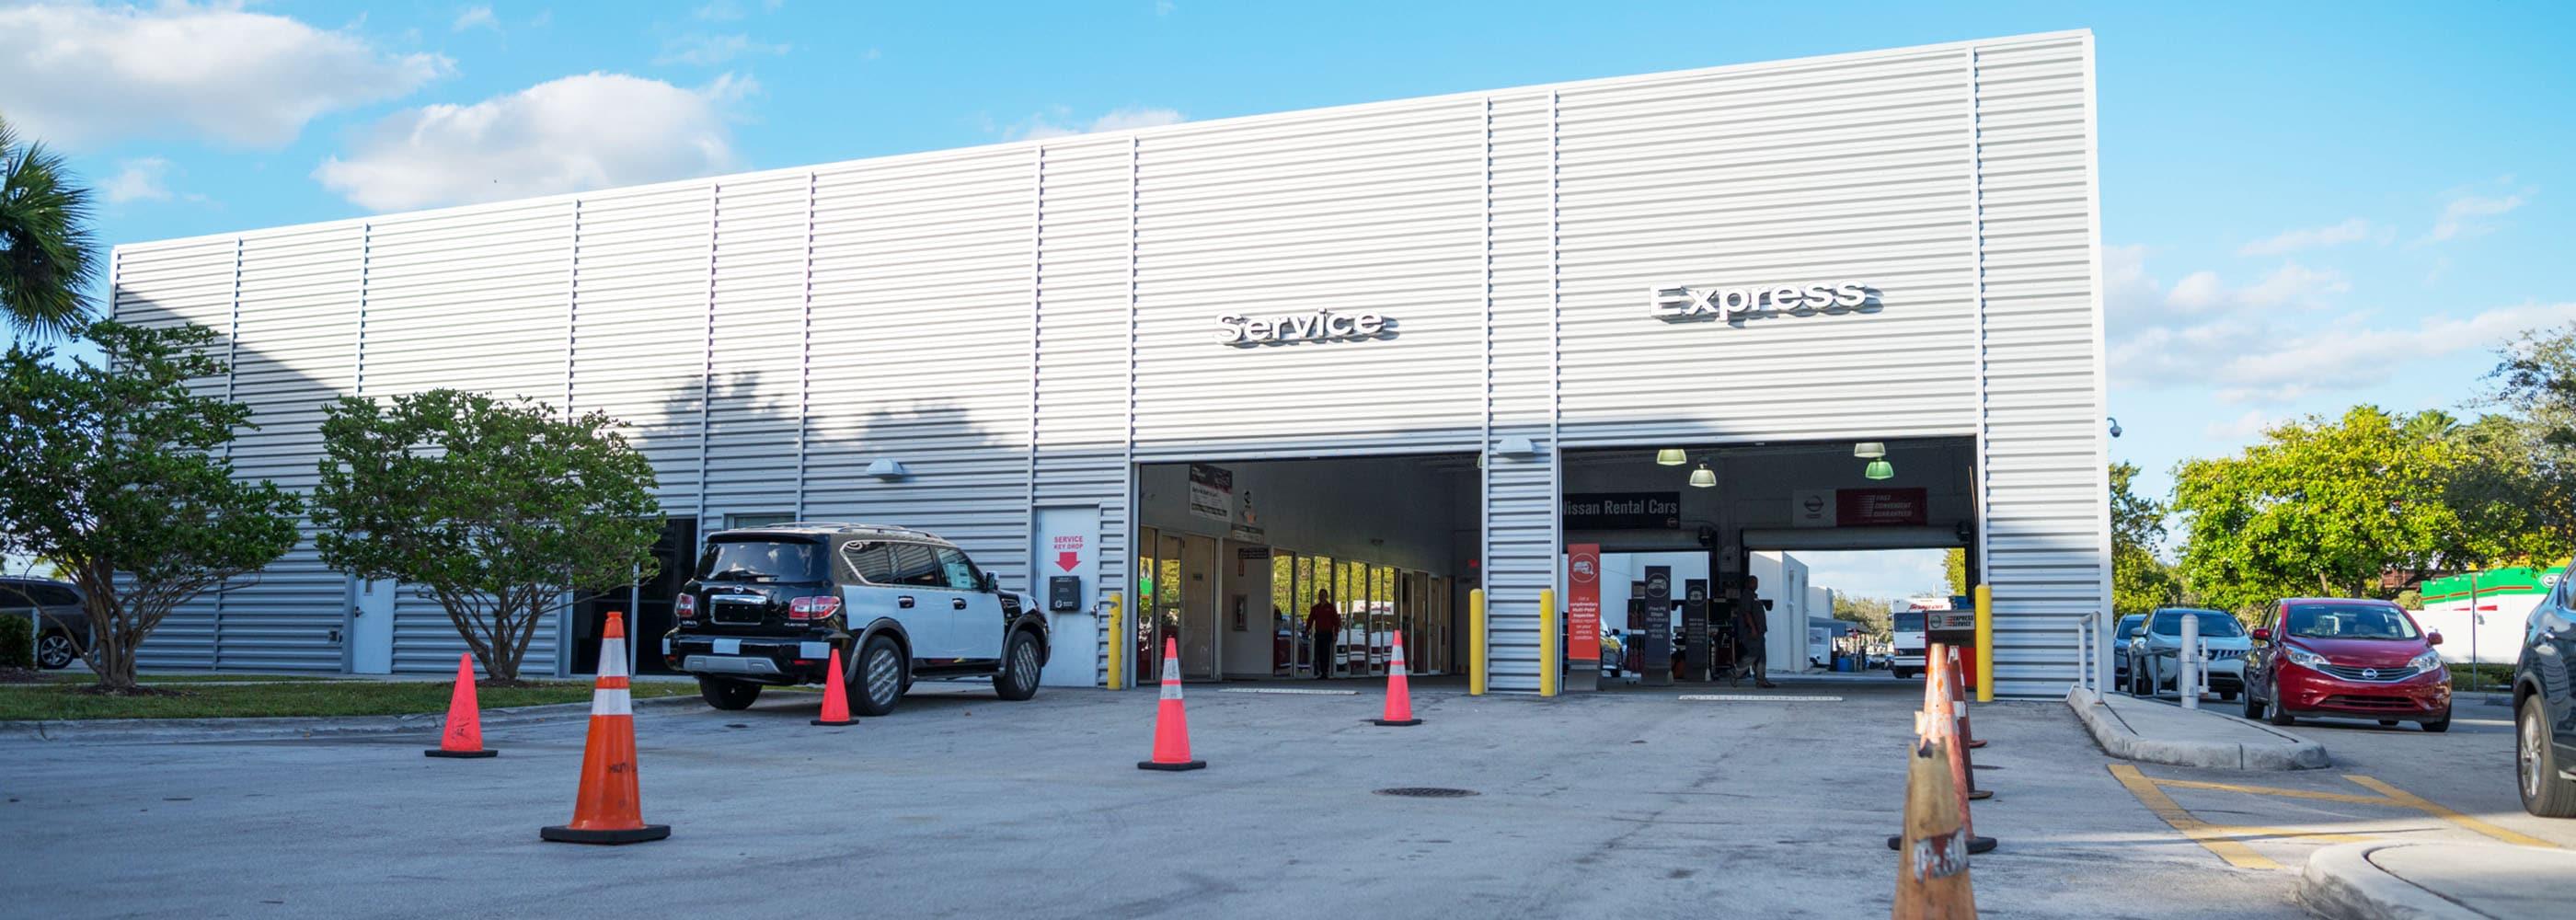 Autonation Nissan Kendall Nissan Service Center